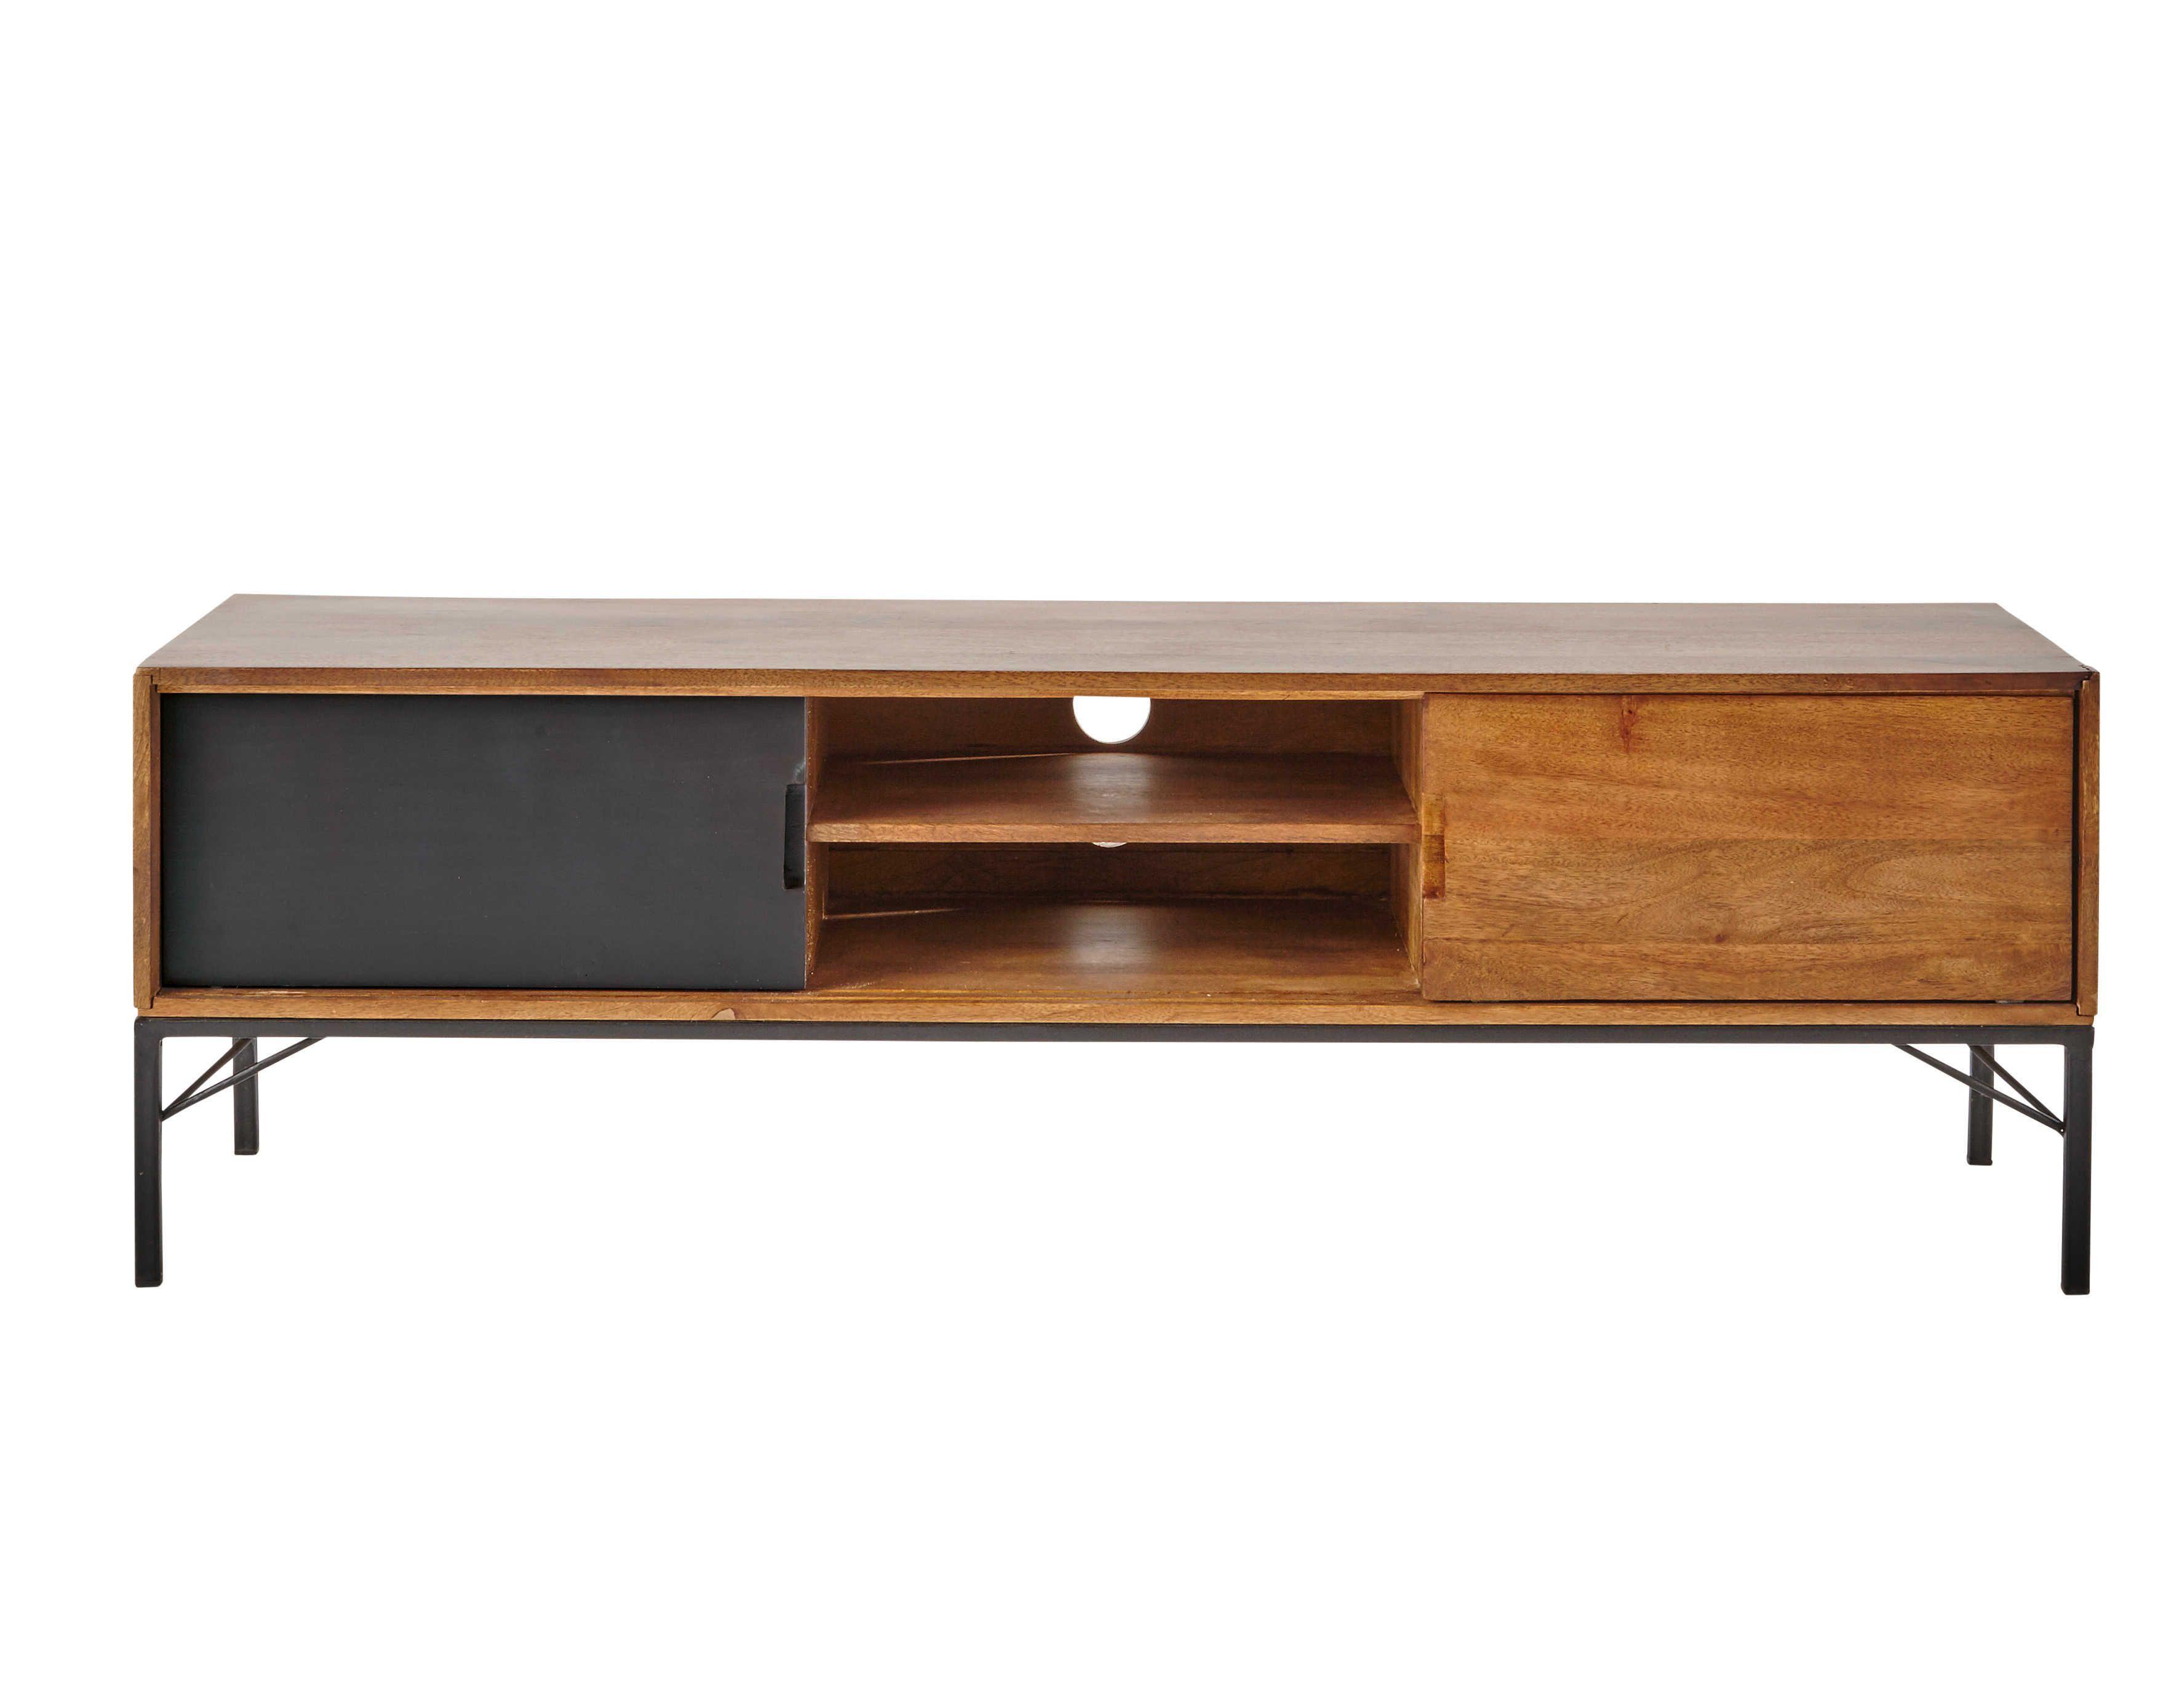 Tv meubel mangohout breedte 150 cm arty inrichting pinterest - Verf credenza ...